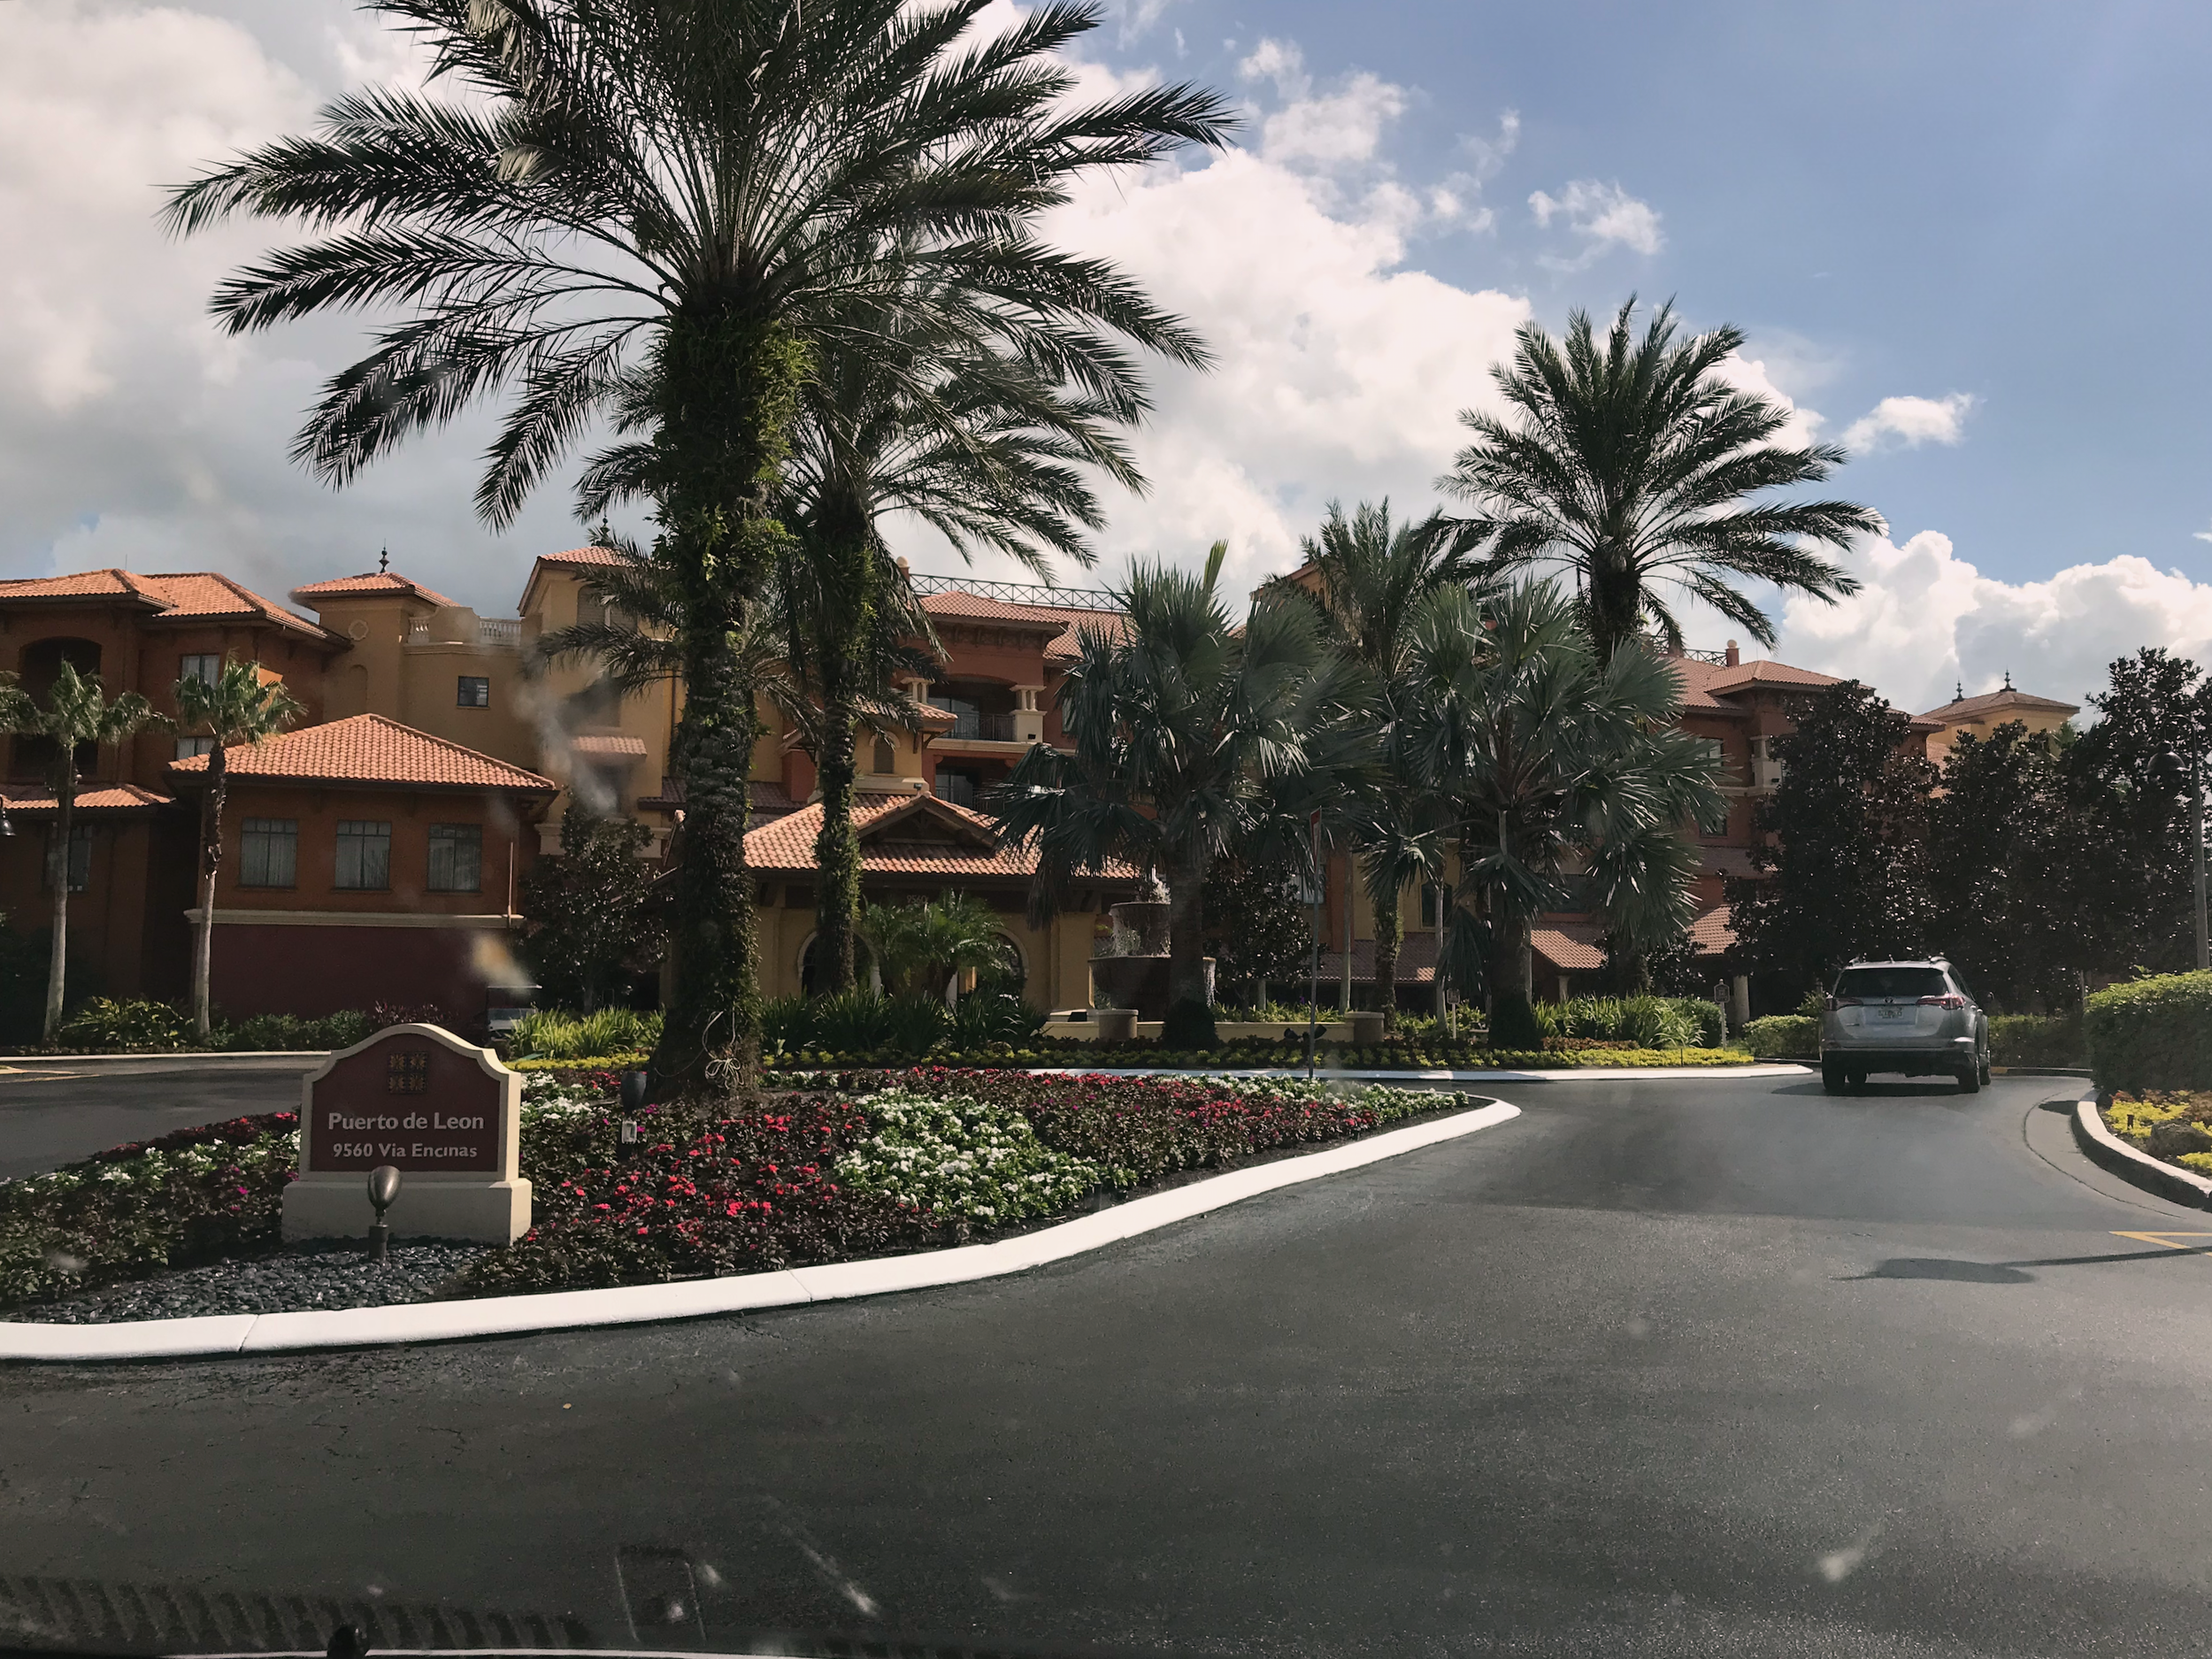 Wyndham Bonnet Creek Resort Visitors Center driveway  (click to enlarge)